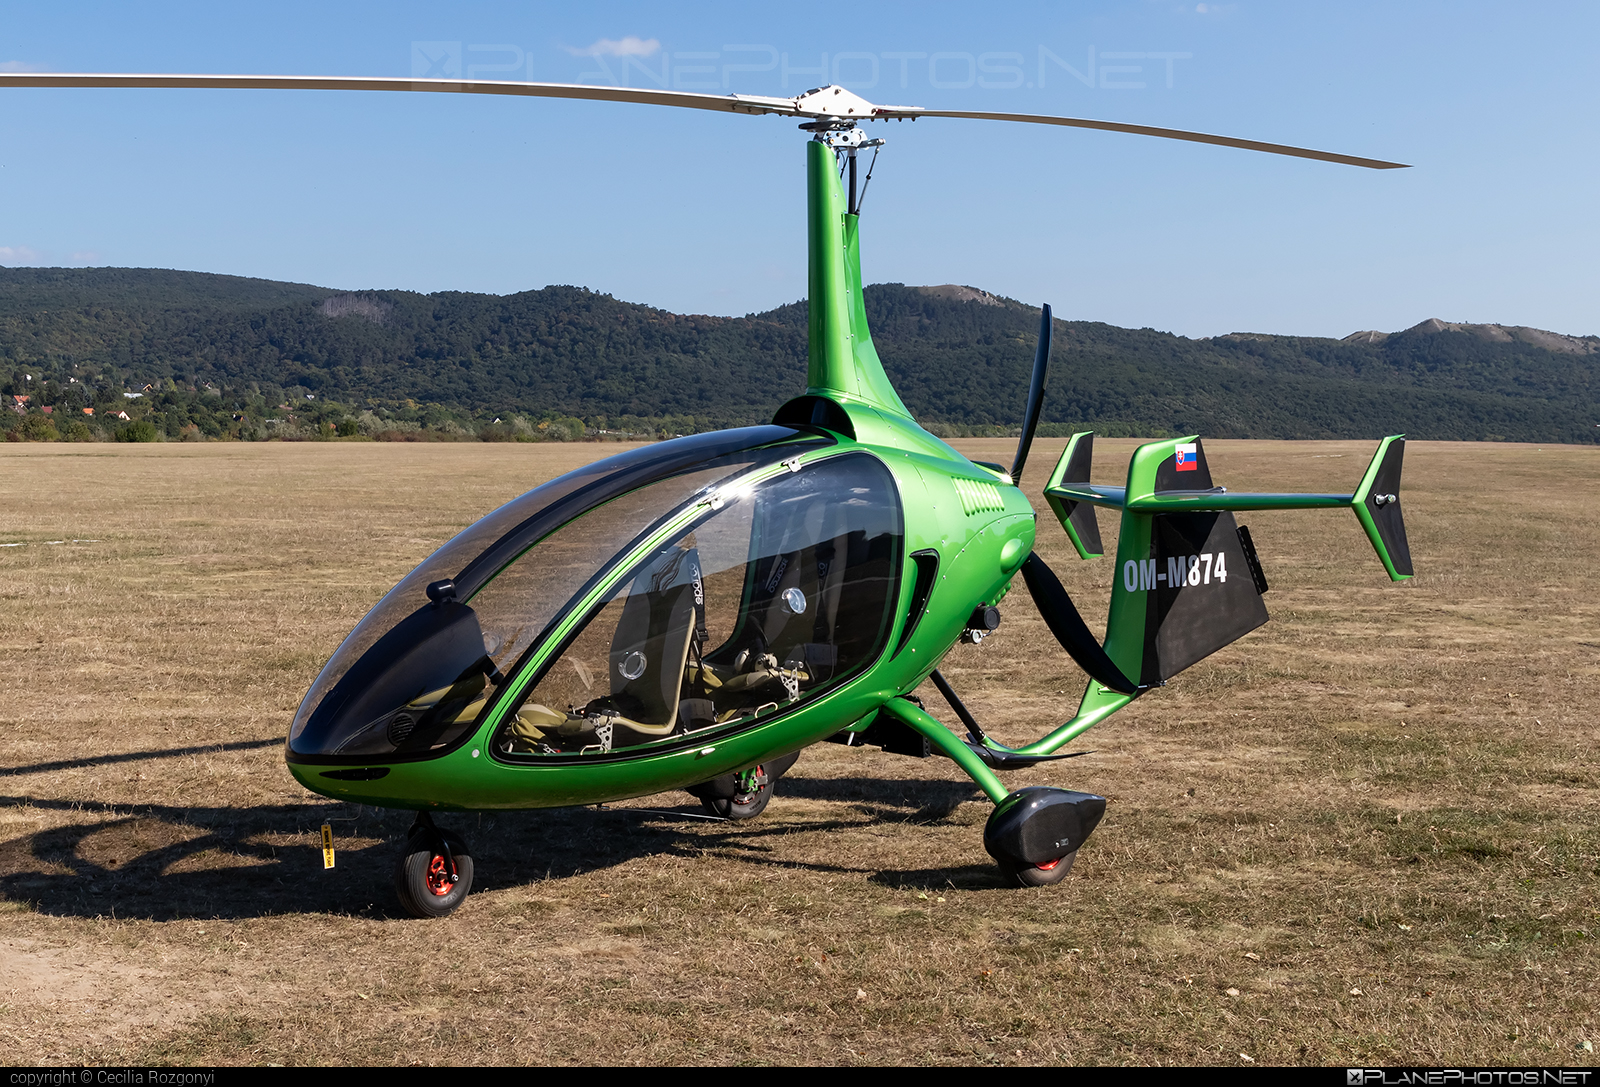 Niki Rotor Aviation Kallithea - OM-M874 operated by Private operator #Farkashegy #KallitheaAutogyro #NikiRotorAviation #OM-M874 #Ultralights #nra #nraKallithea